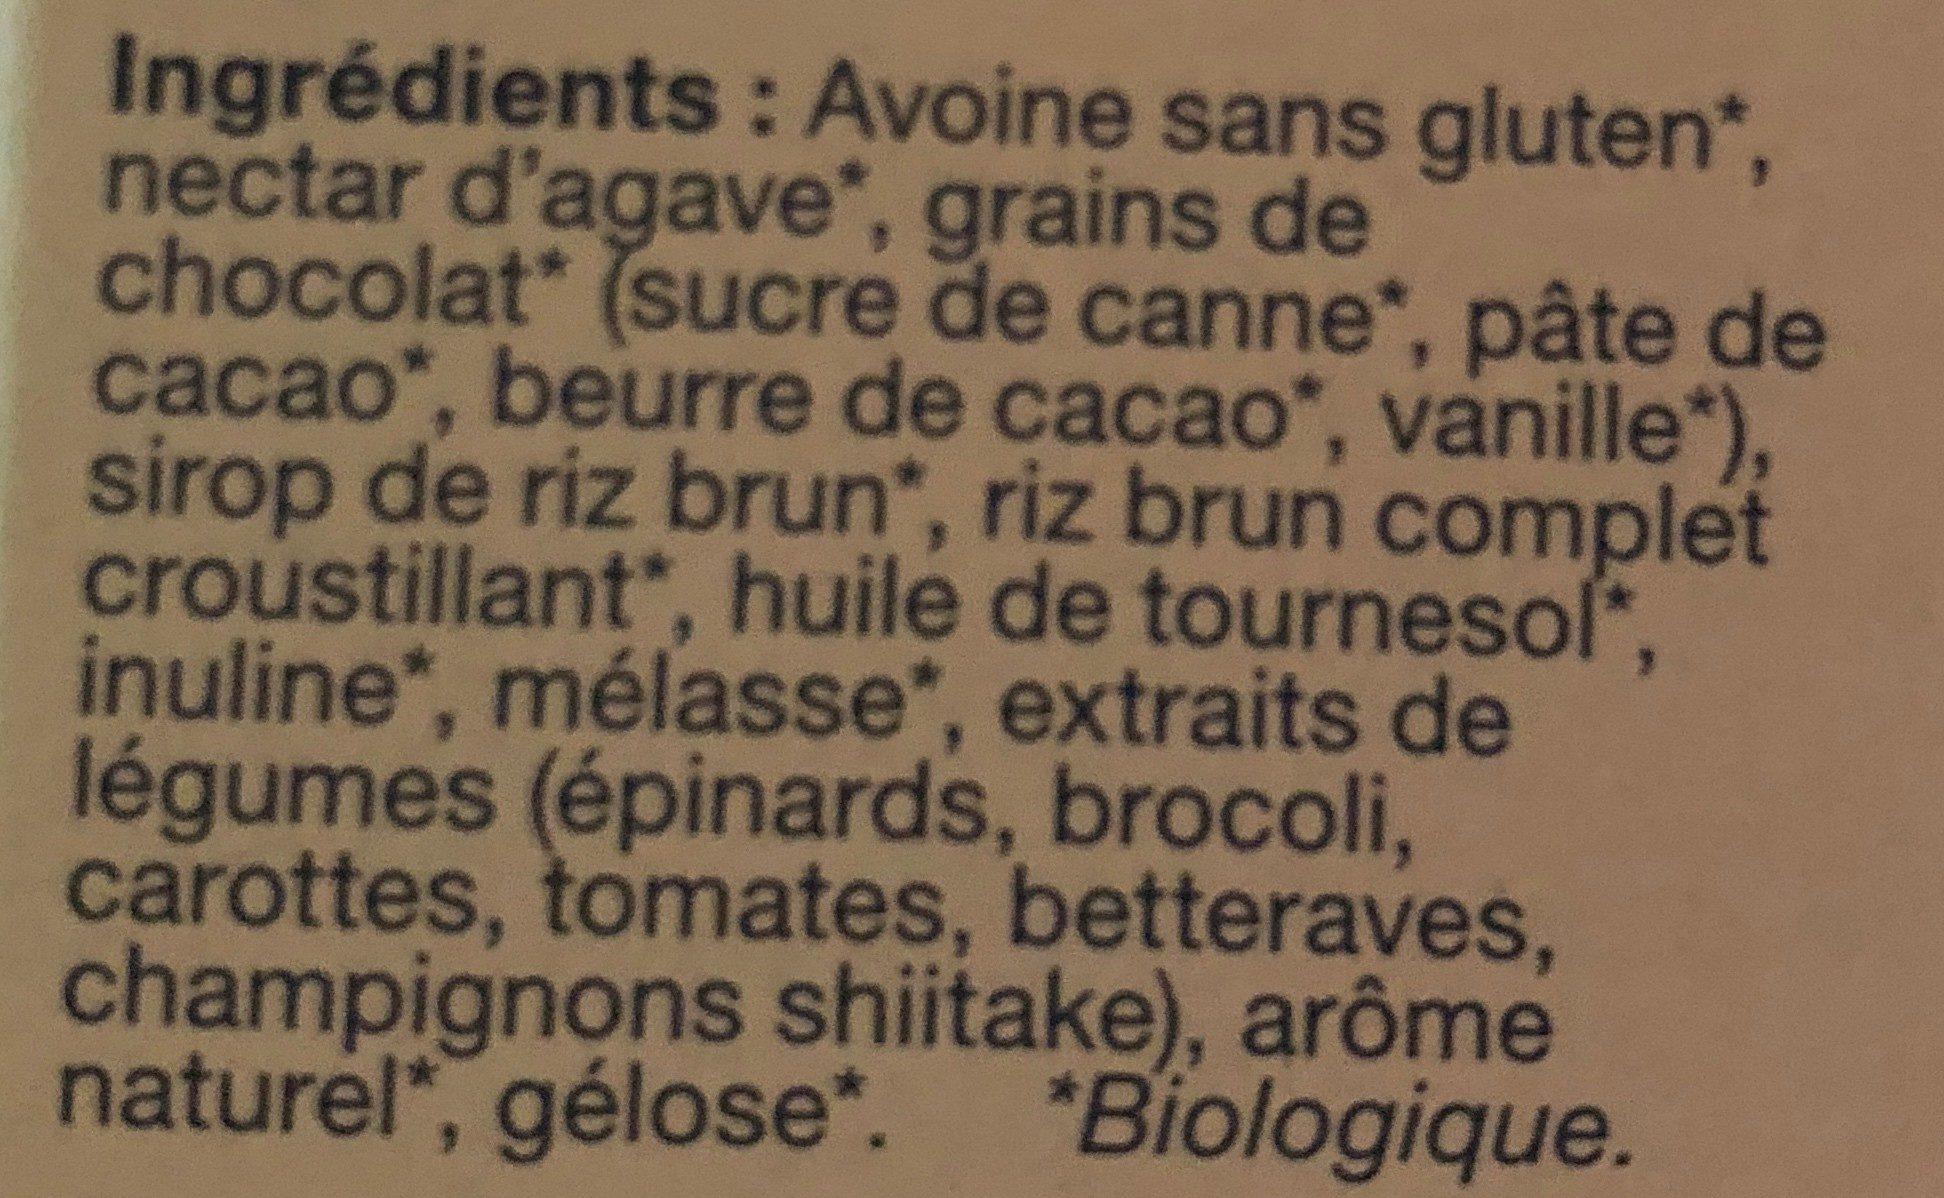 Barres de céréales made good grains de chocolat - Ingredients - fr